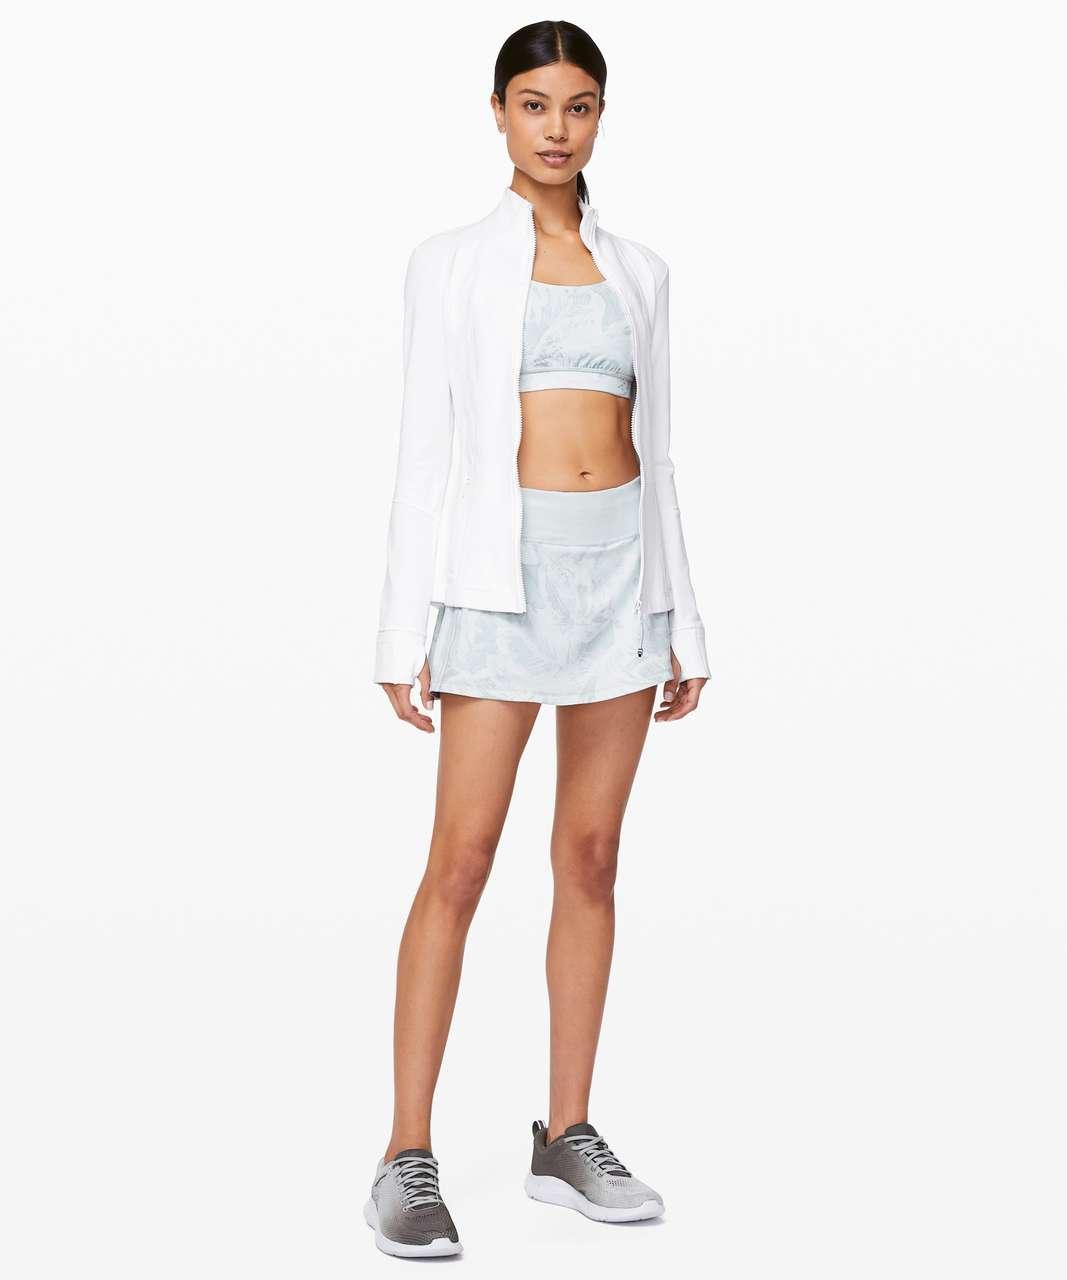 "Lululemon Pace Rival Skirt (Regular) *No Panels 13"" - Mini Tropical Shadow Starlight Multi / Alpine White"